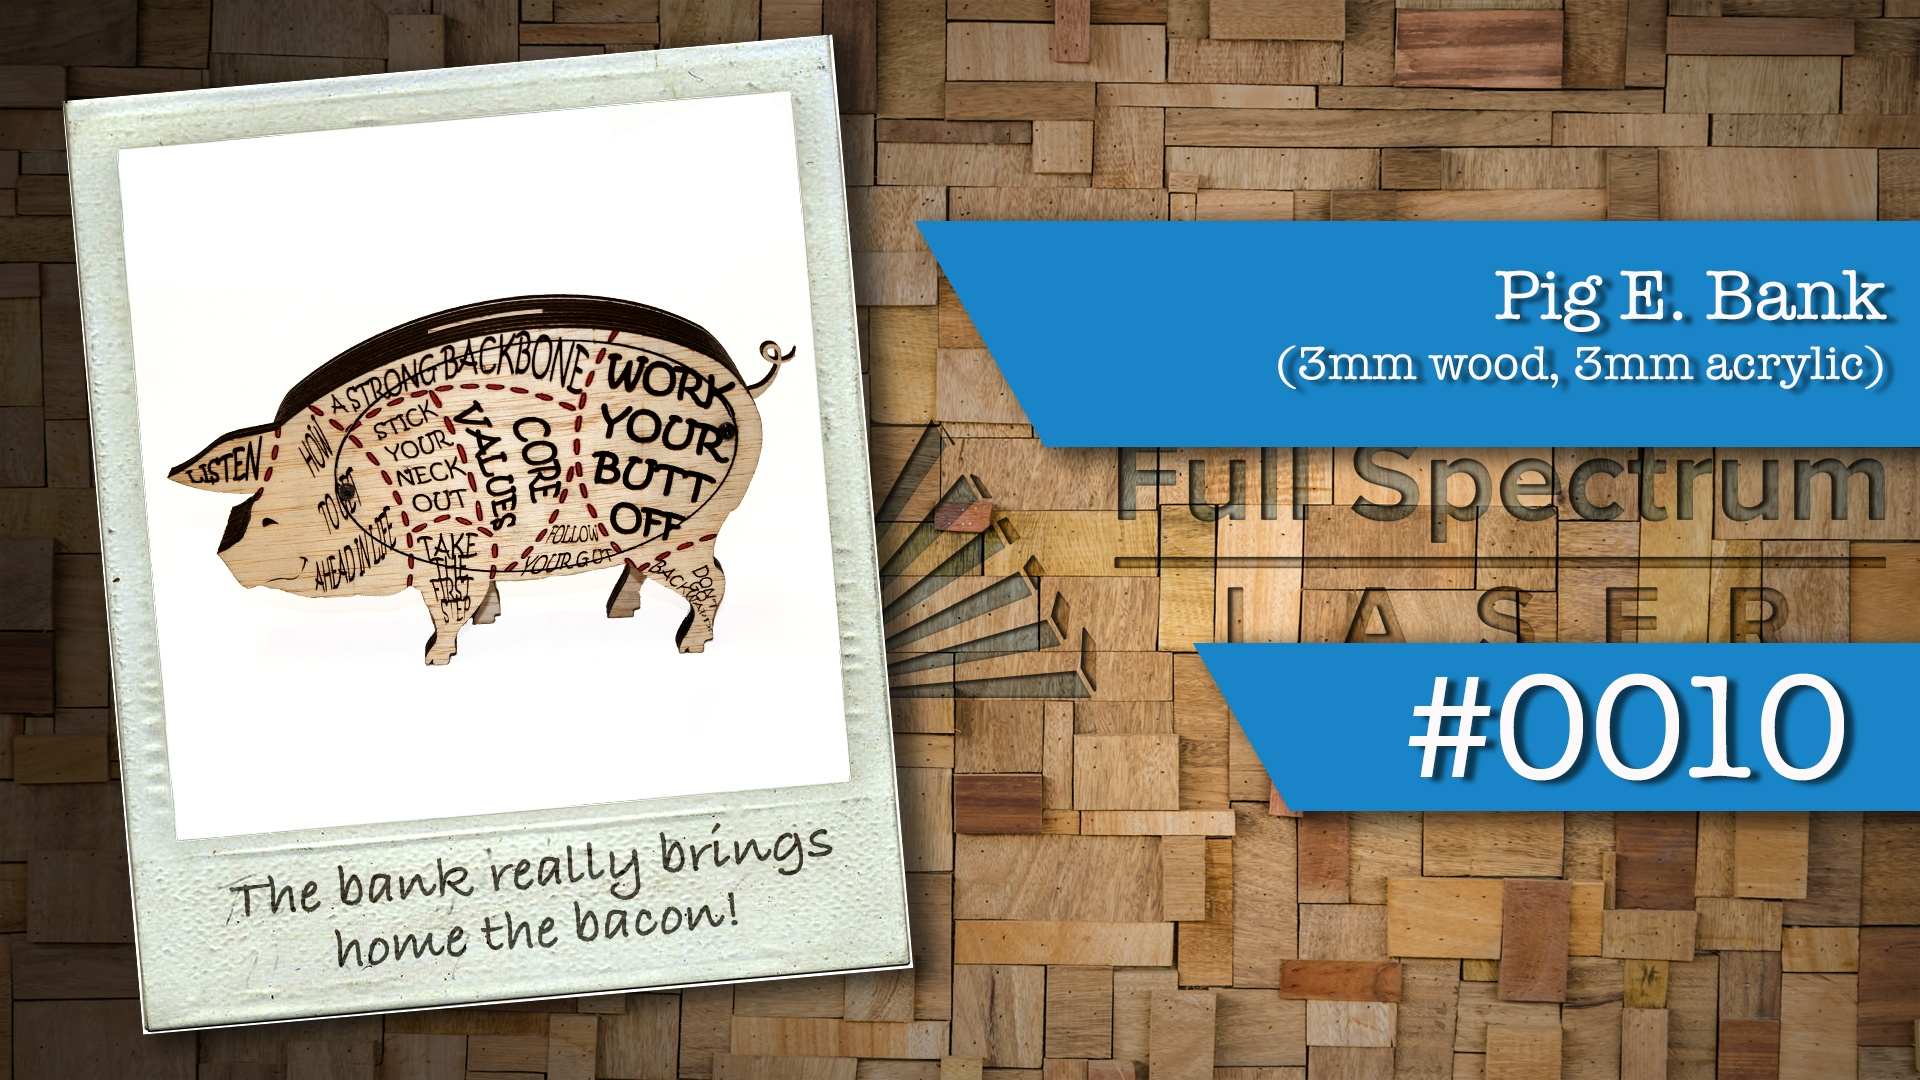 010 - Pig E Bank.jpg